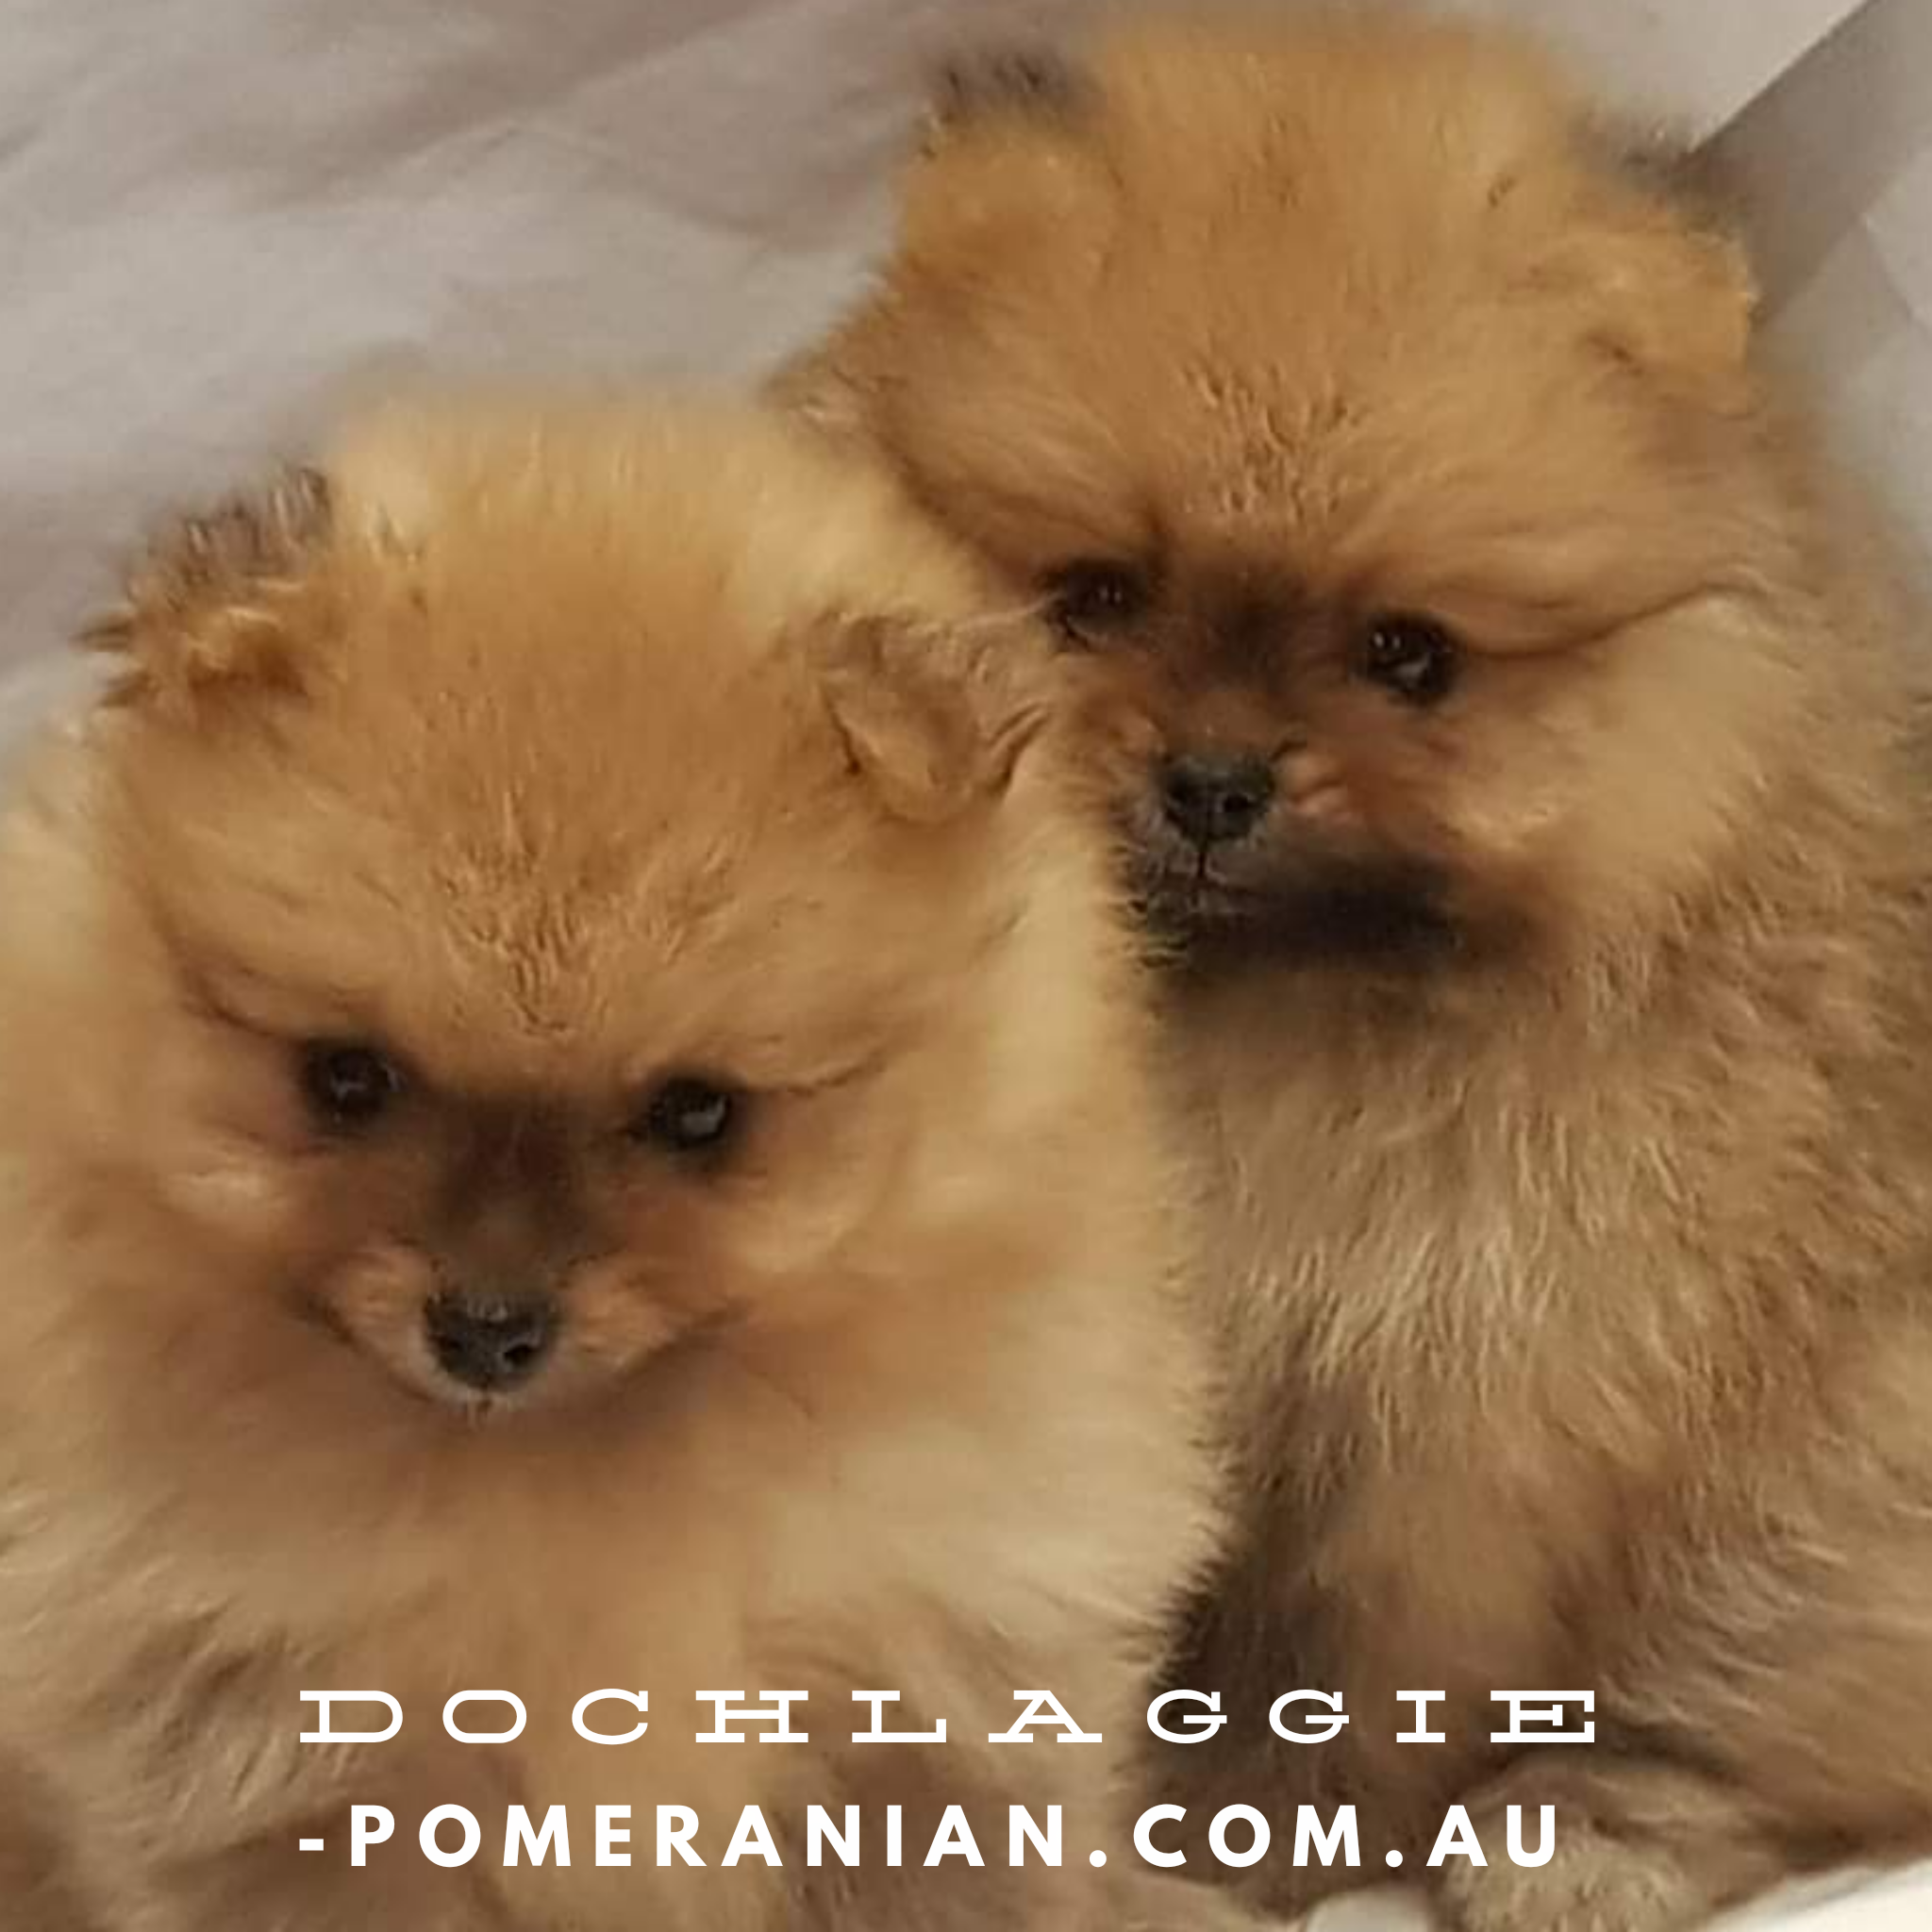 Dochlaggie Pomeranian Puppies Melbourne Dochlaggie Dochlaggiepomeranians Pomeranians Pomeranian Pomeraniandog Pomeranian Puppy Puppies Pomeranian